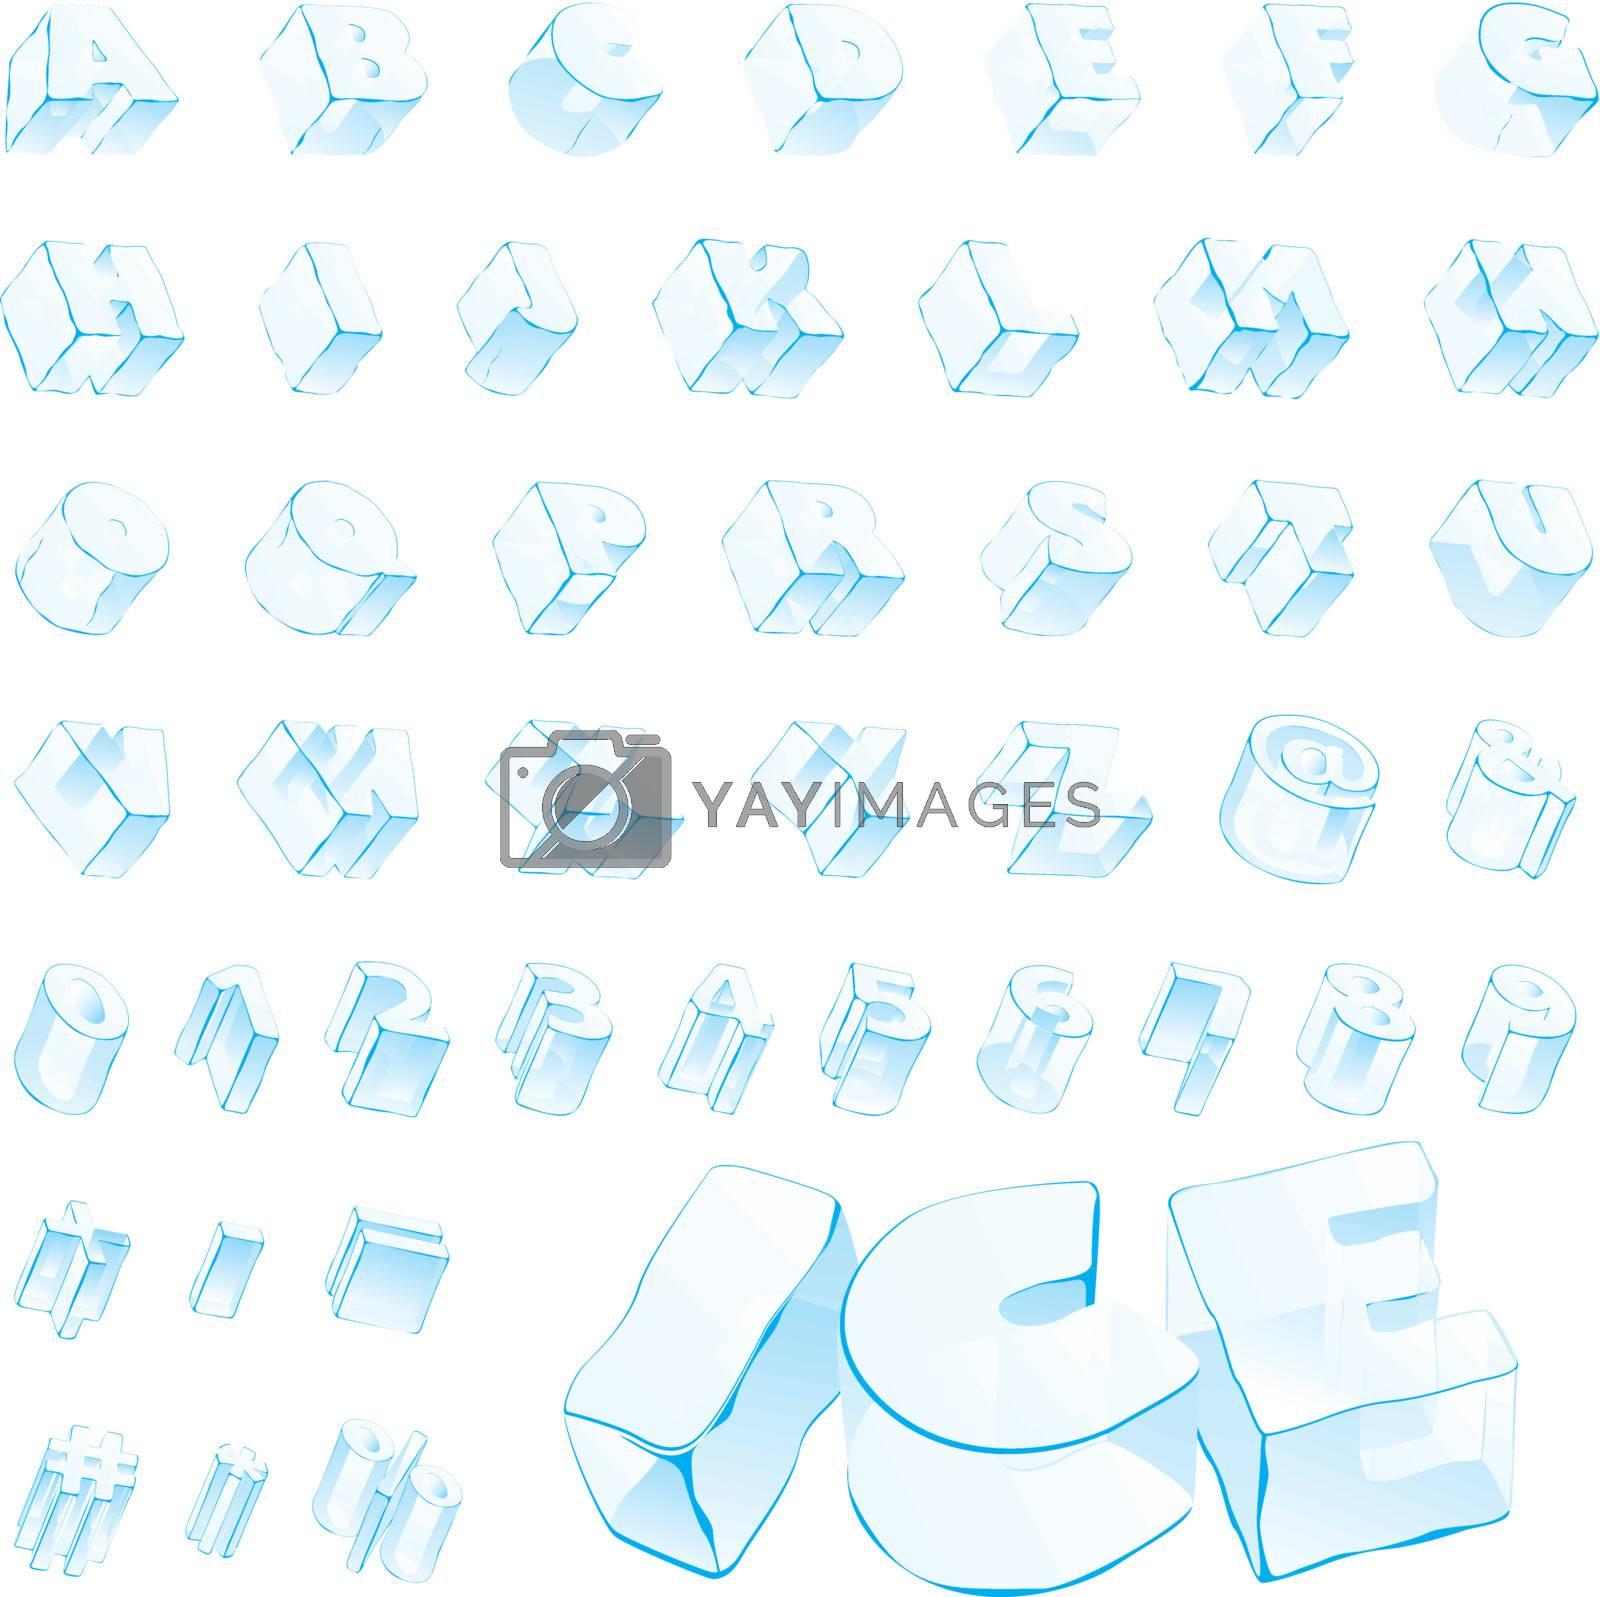 fully editable vector 3d ice alphabet - capitals and numerals